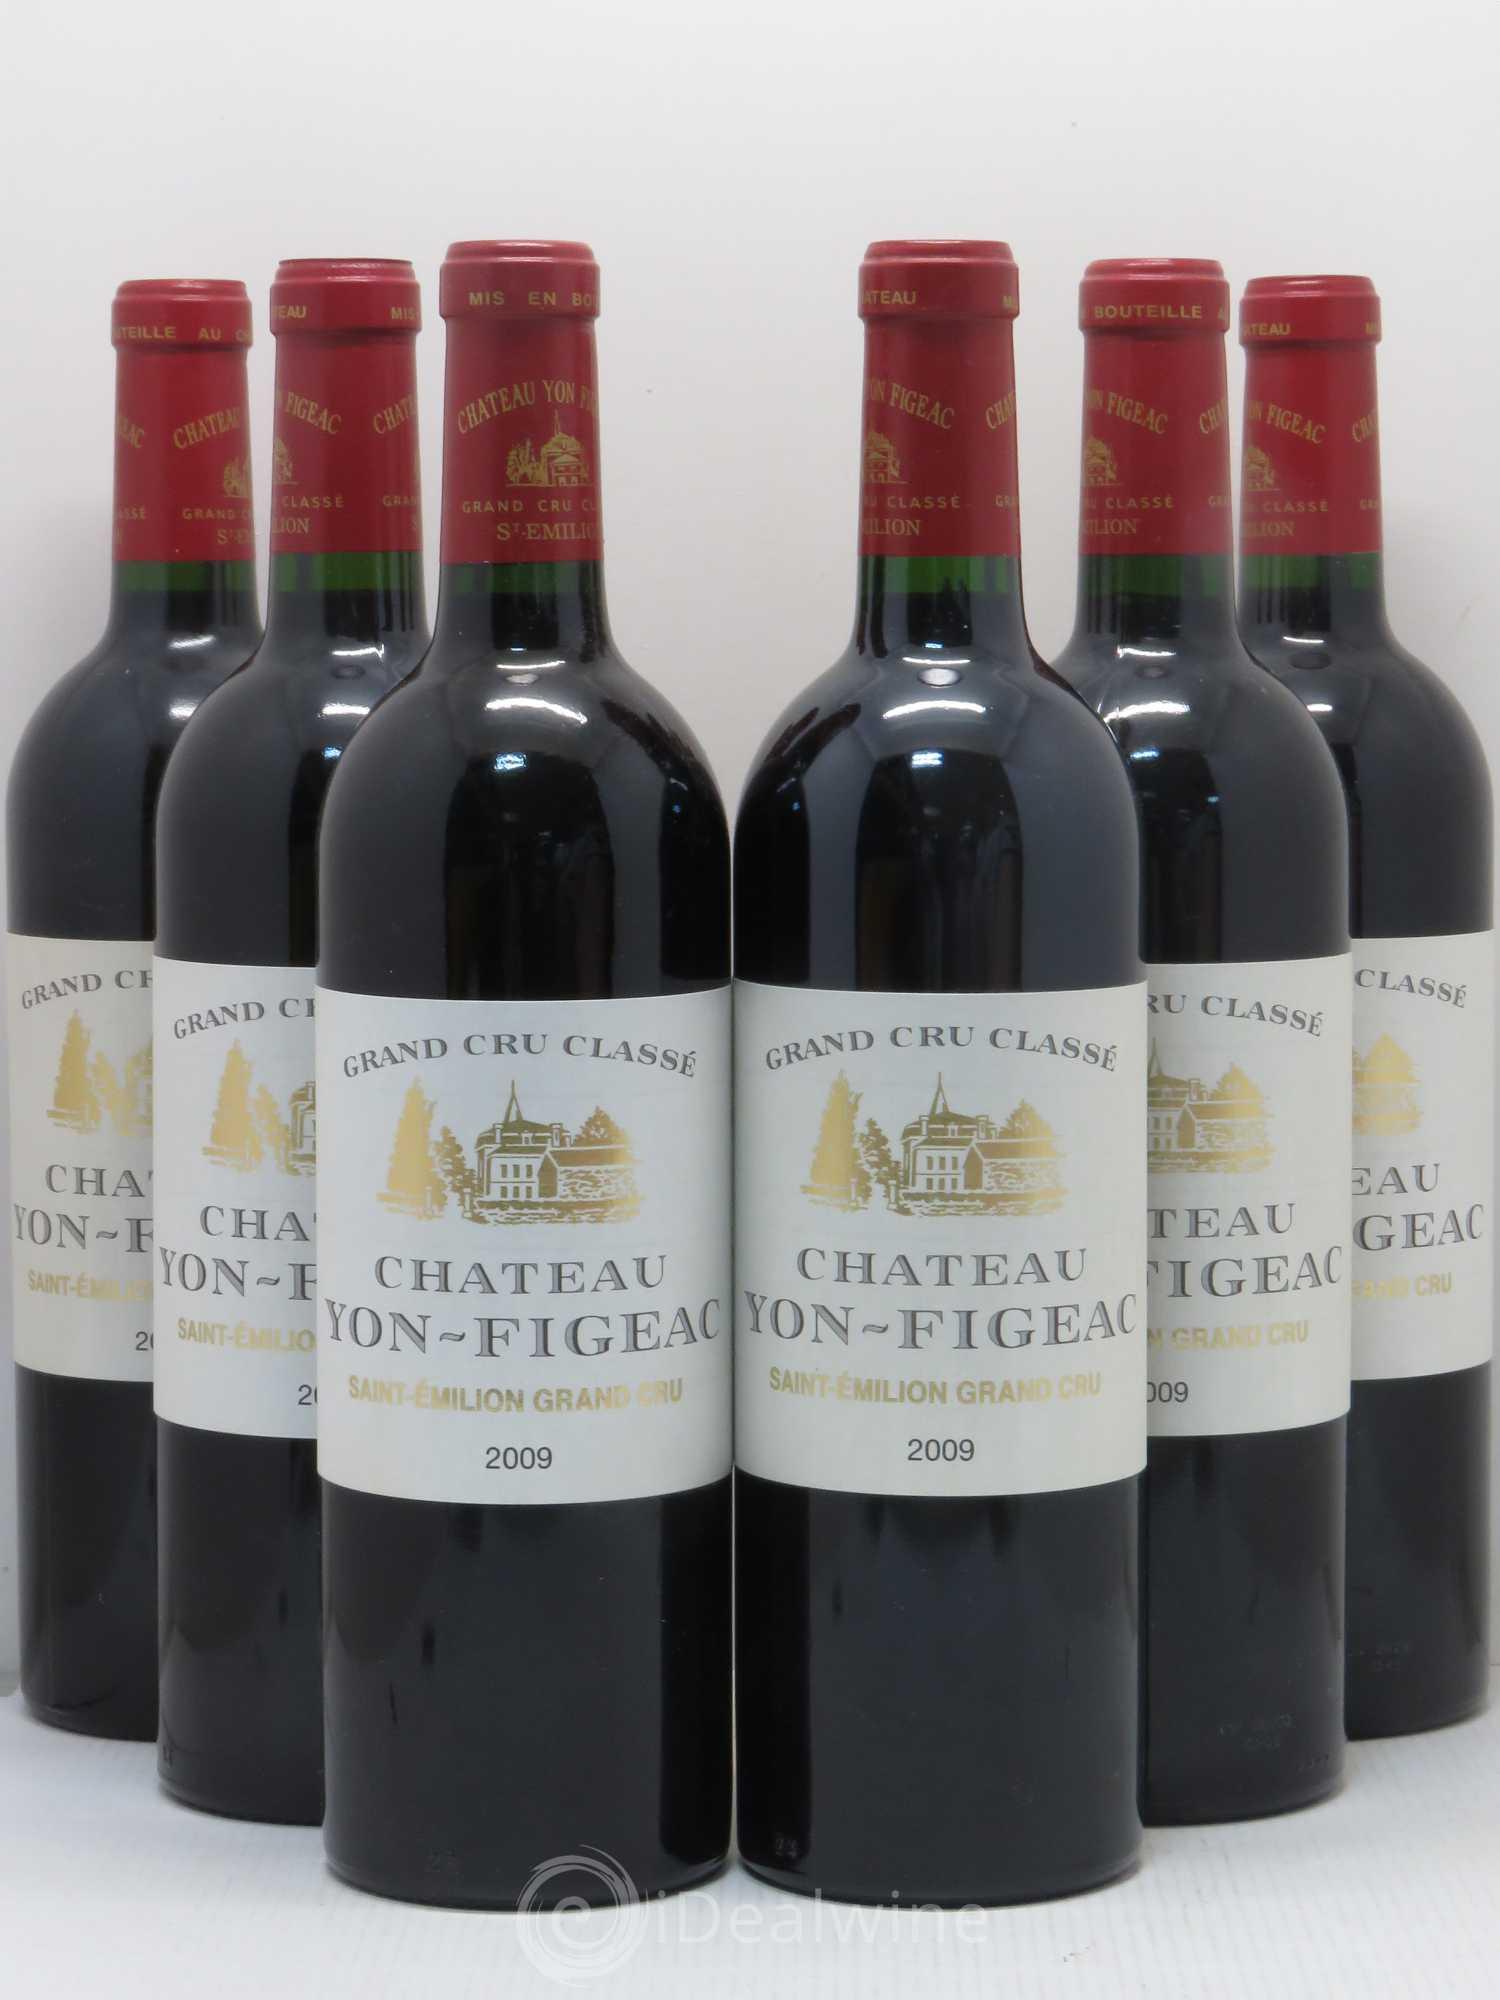 Kết quả hình ảnh cho st emilion grand cru chateau yon figeac 2015